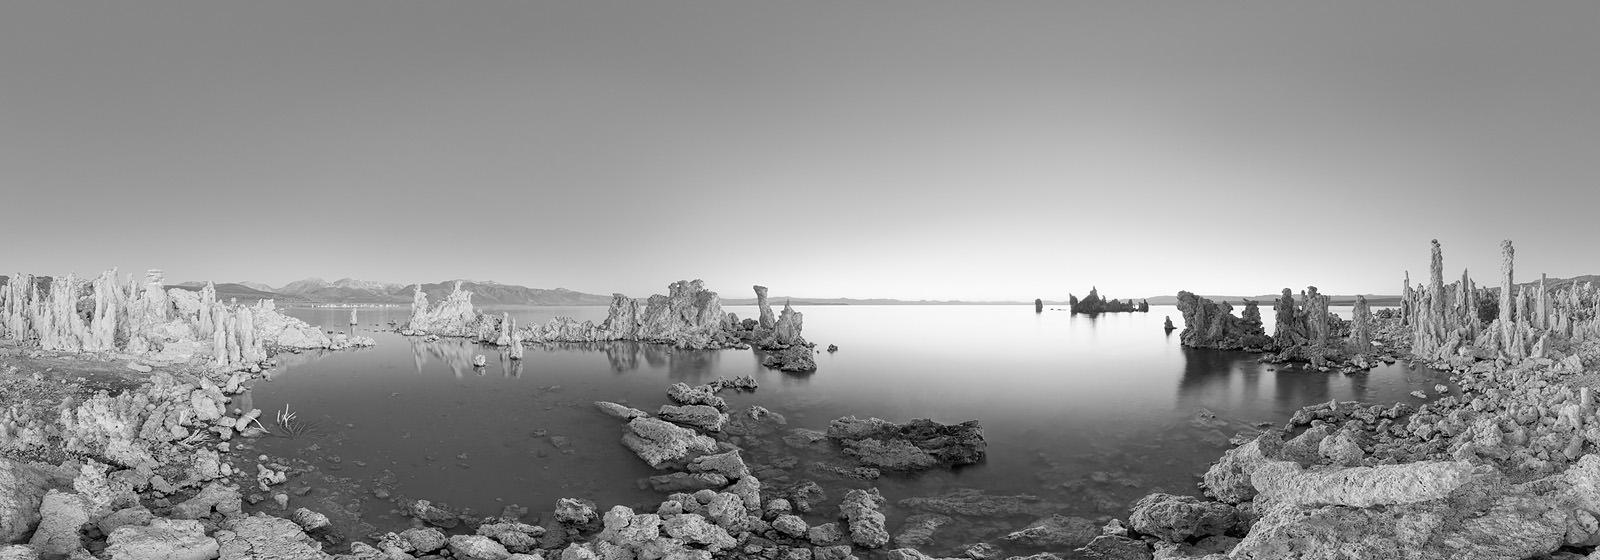 Mono Lake Acrylic - California Black & White Fine Art Photo Print